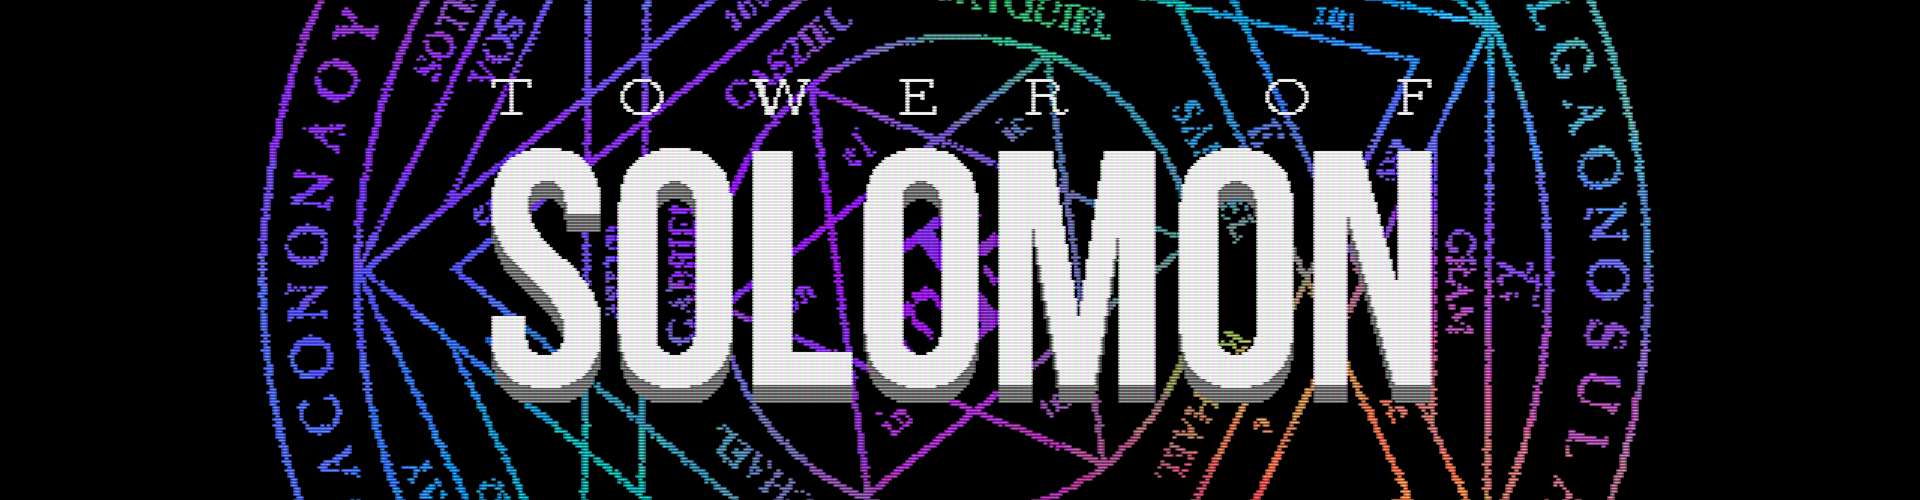 Tower of Solomon